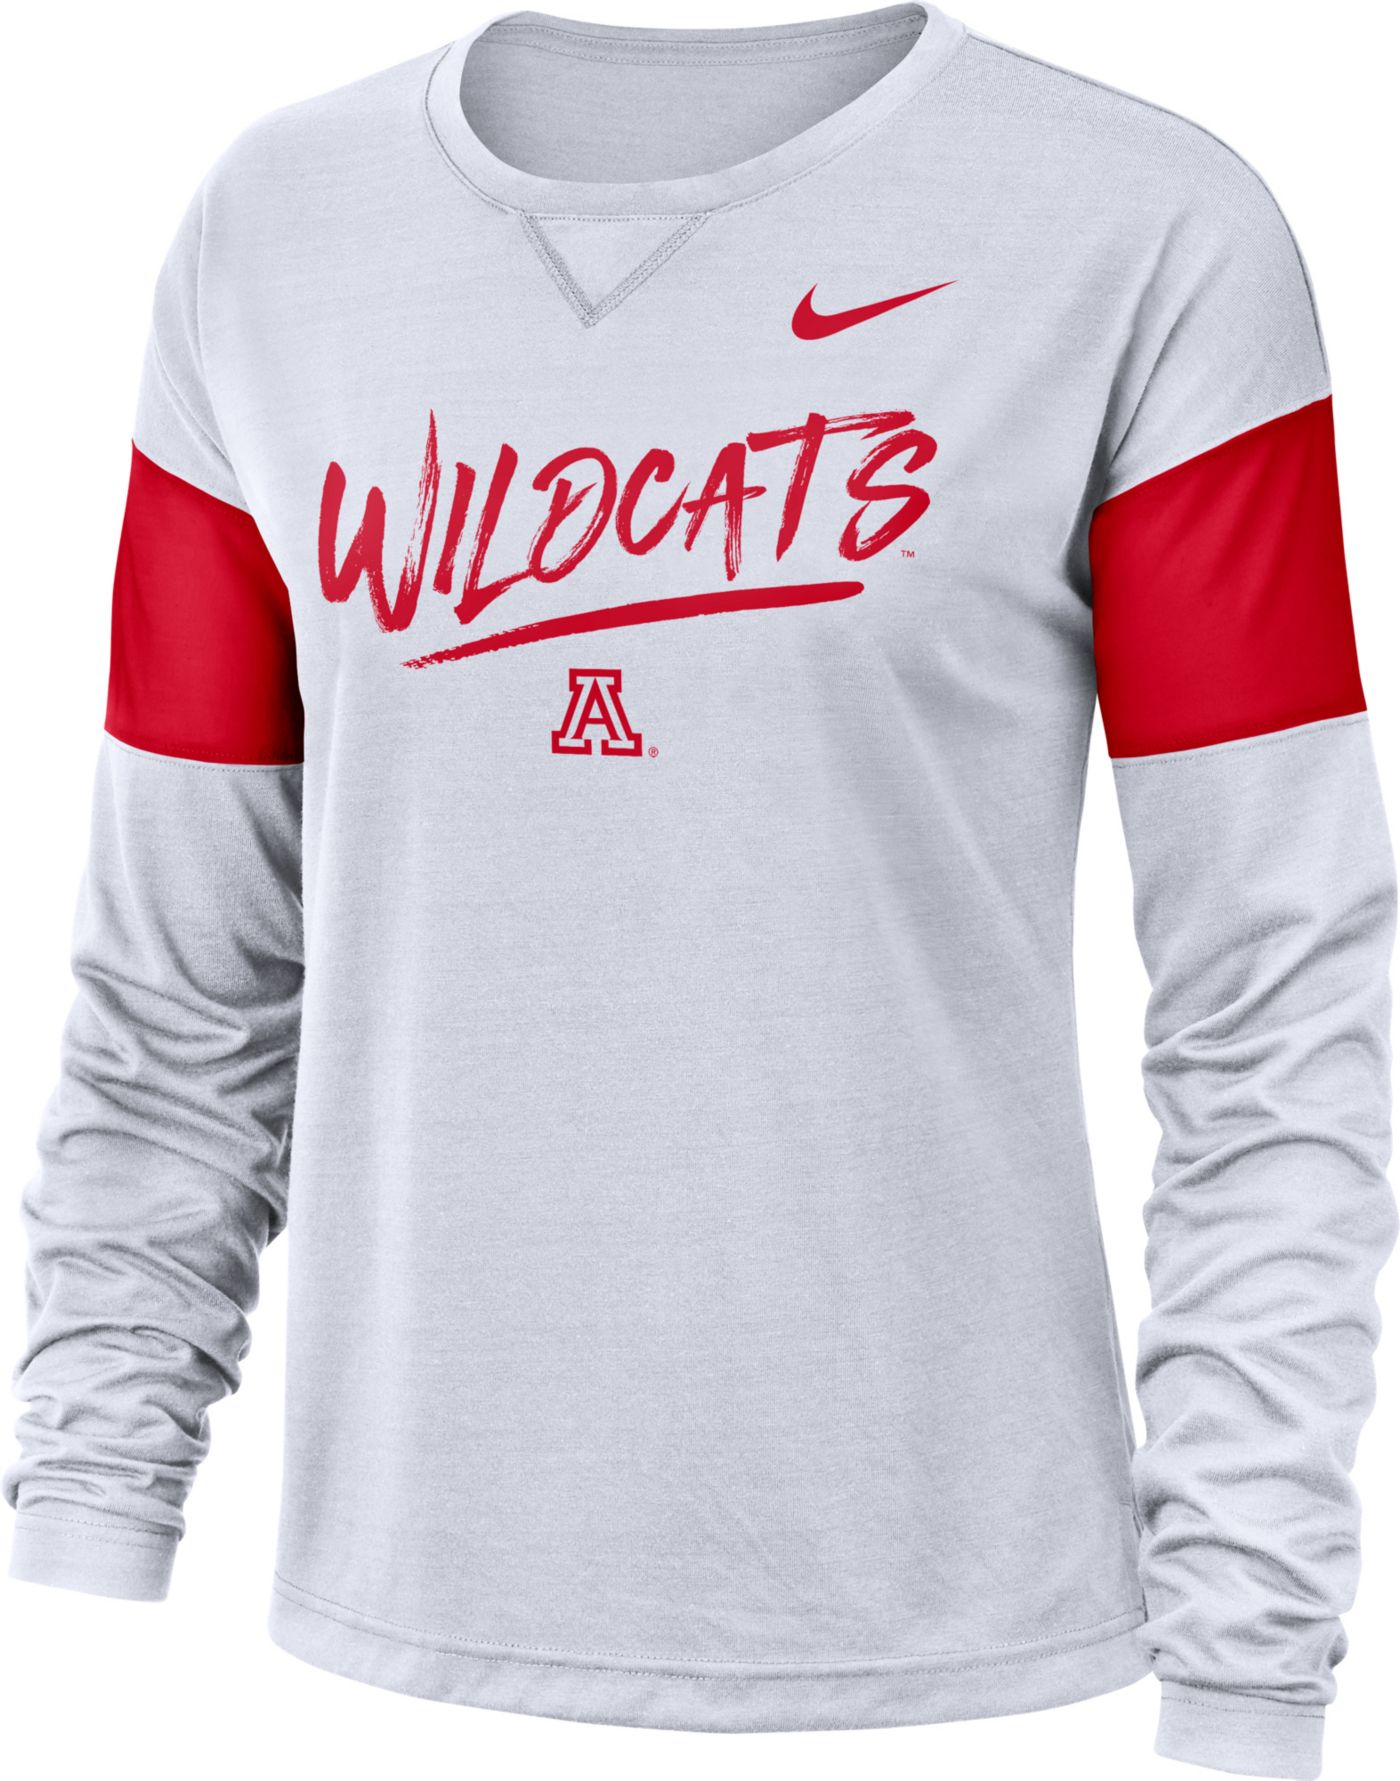 Nike Women's Arizona Wildcats Dri-FIT Breathe Long Sleeve White T-Shirt